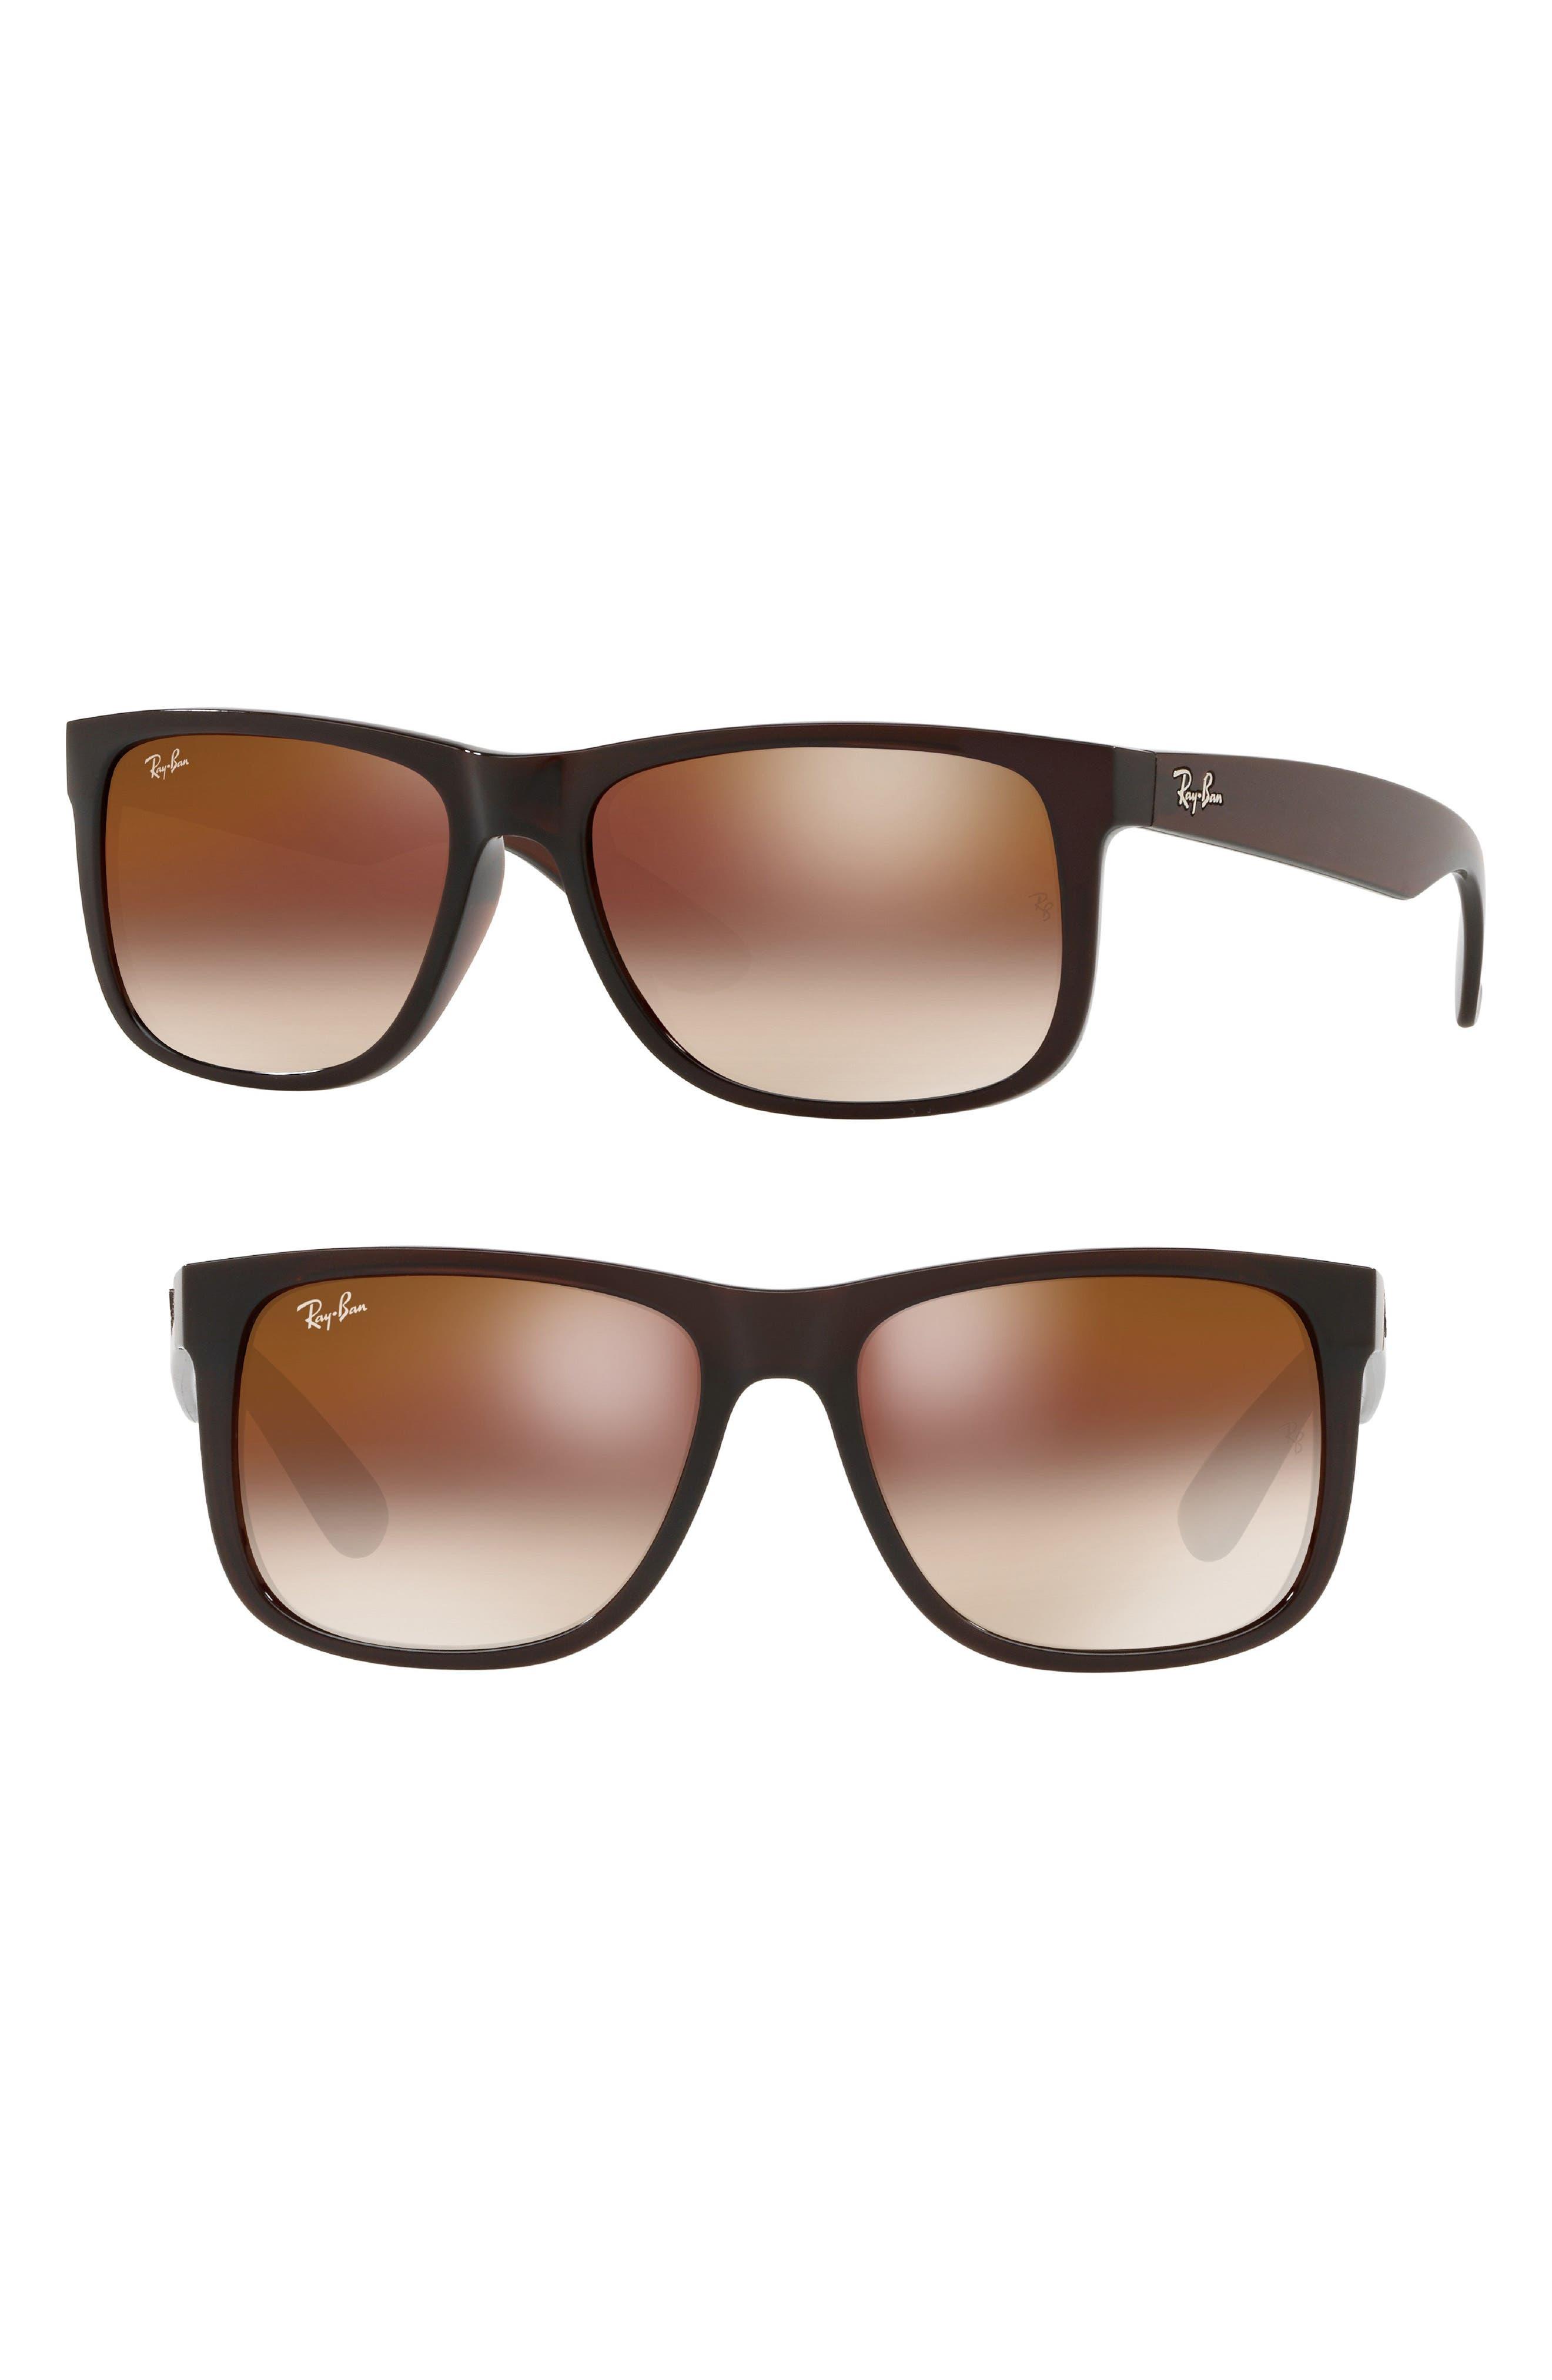 Justin 54mm Sunglasses,                         Main,                         color, Brown